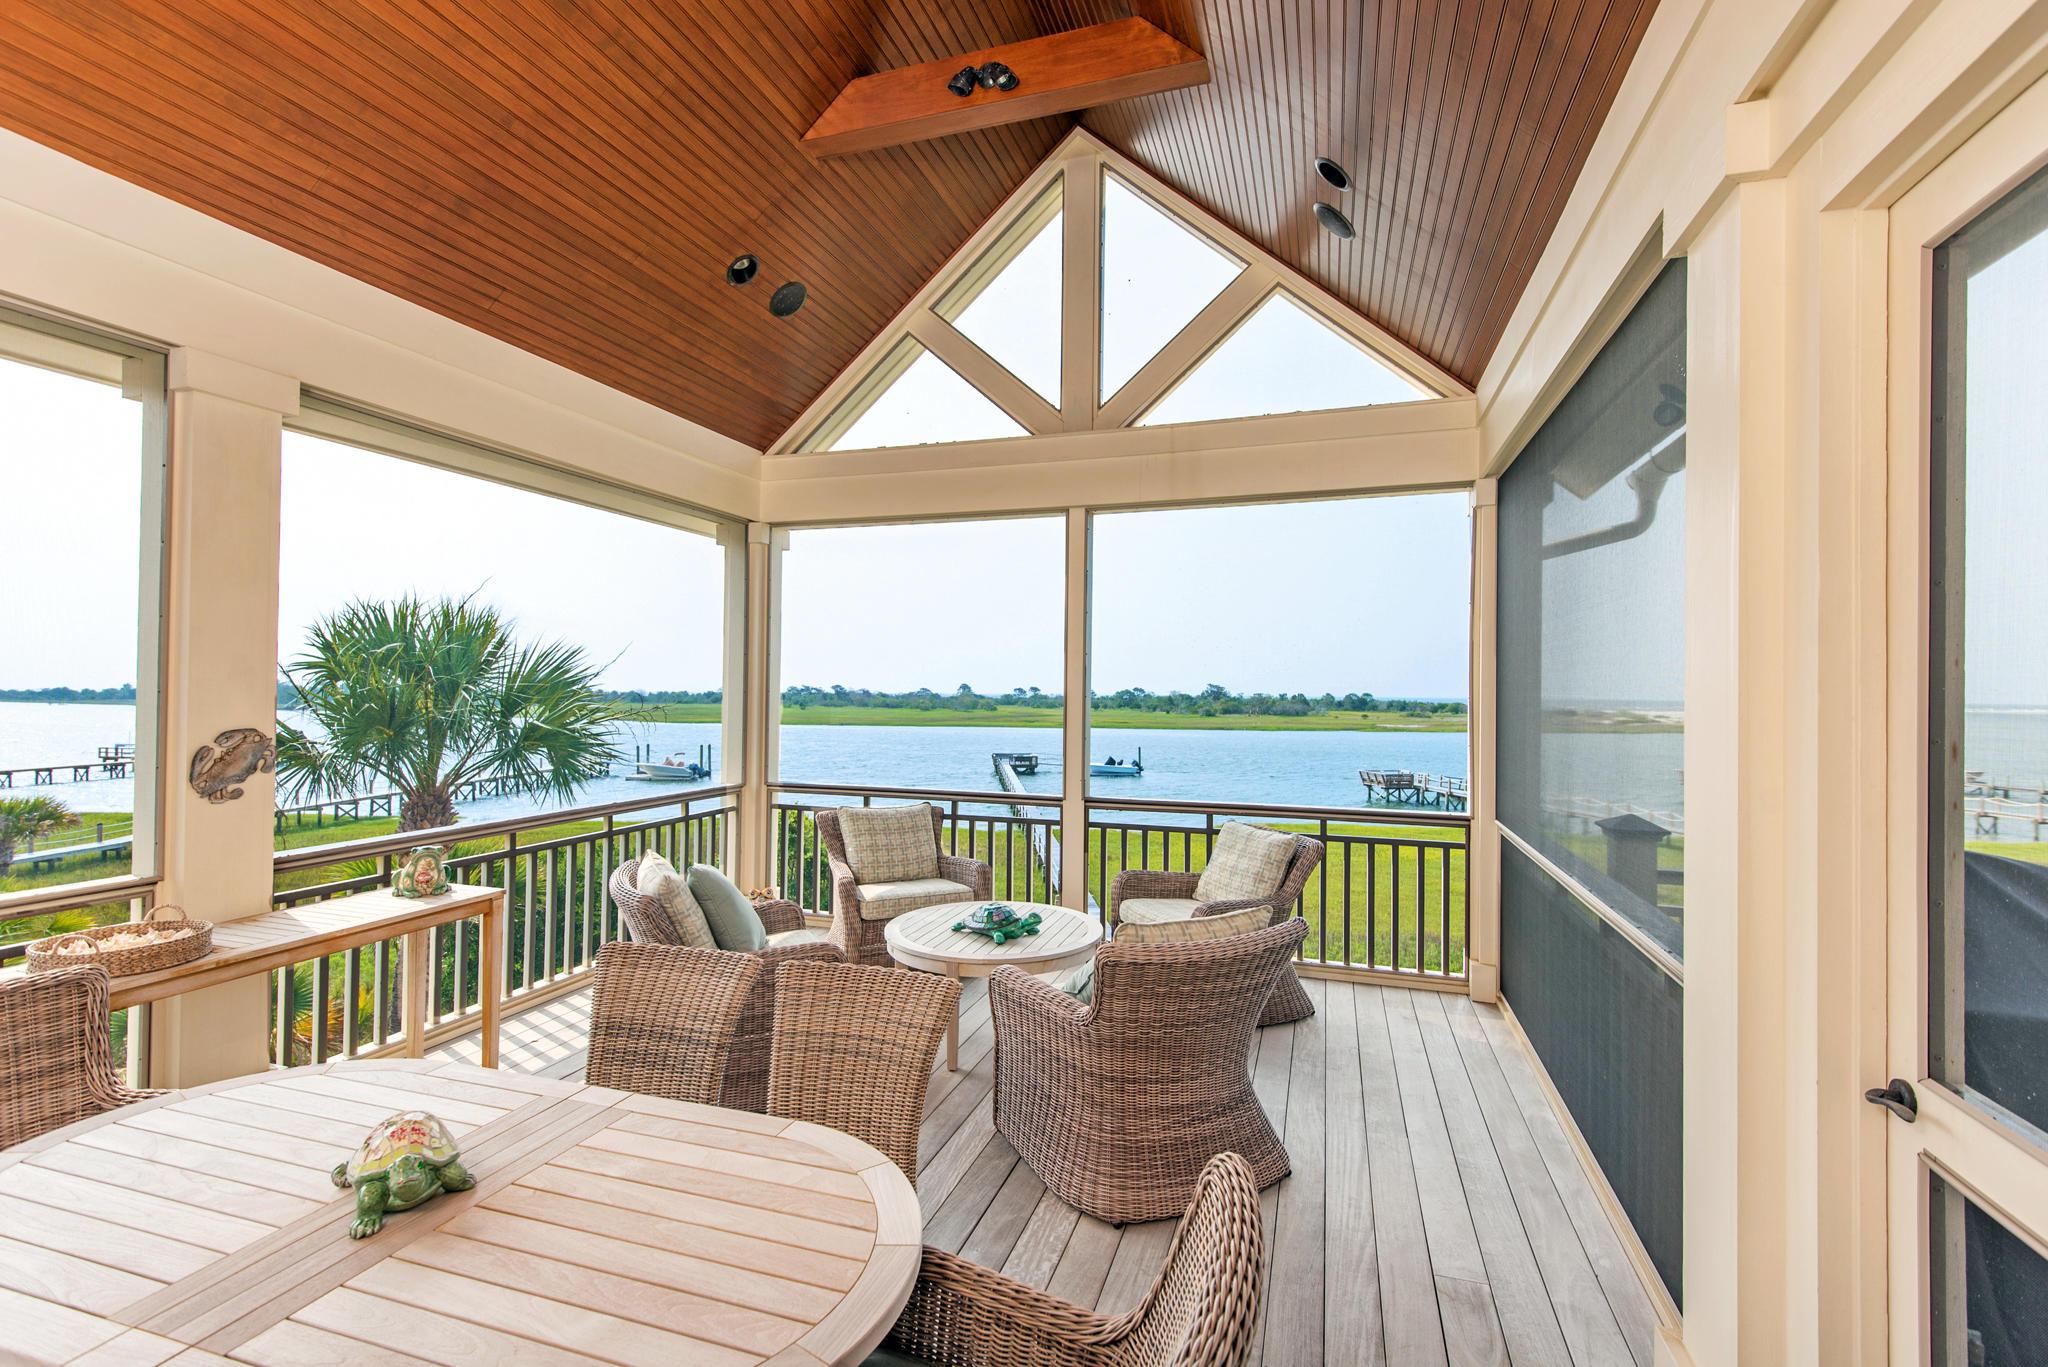 Seabrook Island Homes For Sale - 3135 Marshgate, Seabrook Island, SC - 44